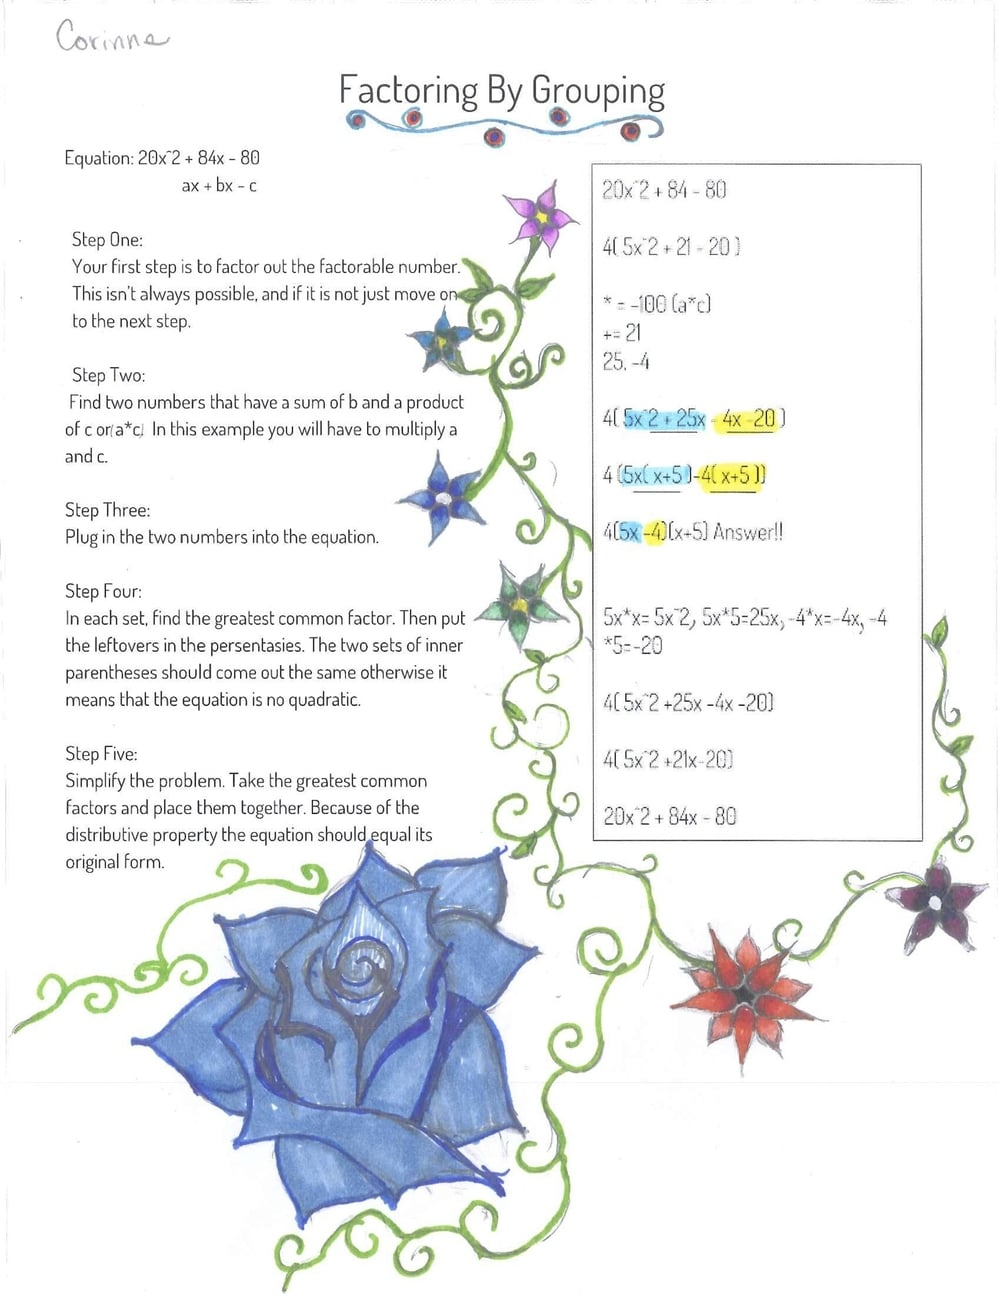 Corinne Study Guide.jpg